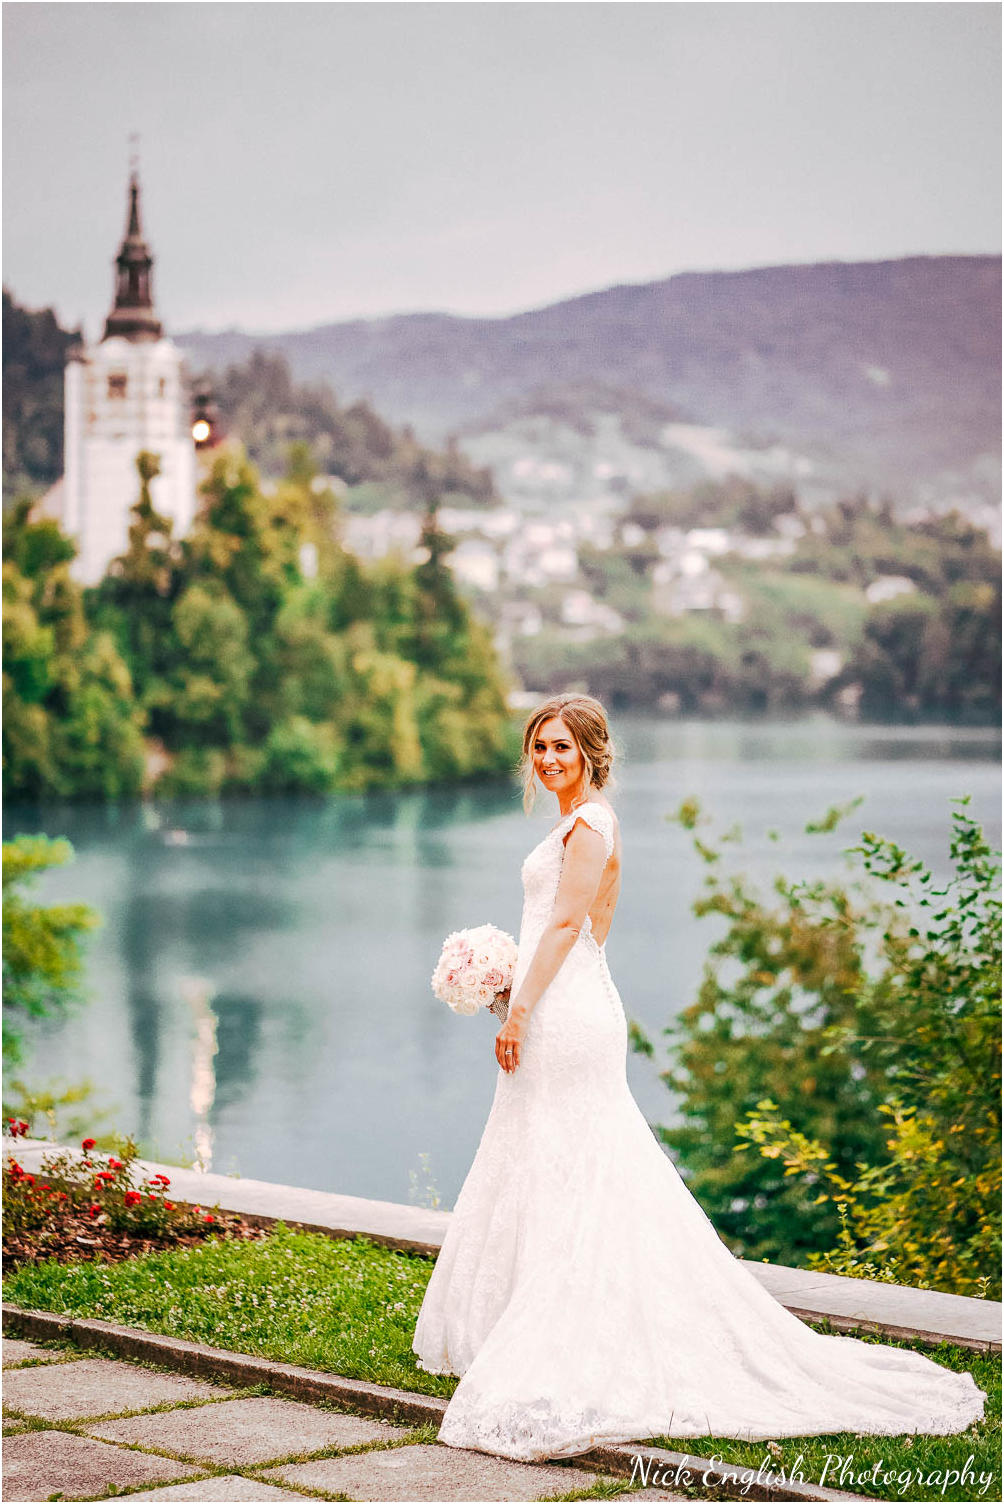 Destination_Wedding_Photographer_Slovenia_Nick_English_Photography-91.jpg